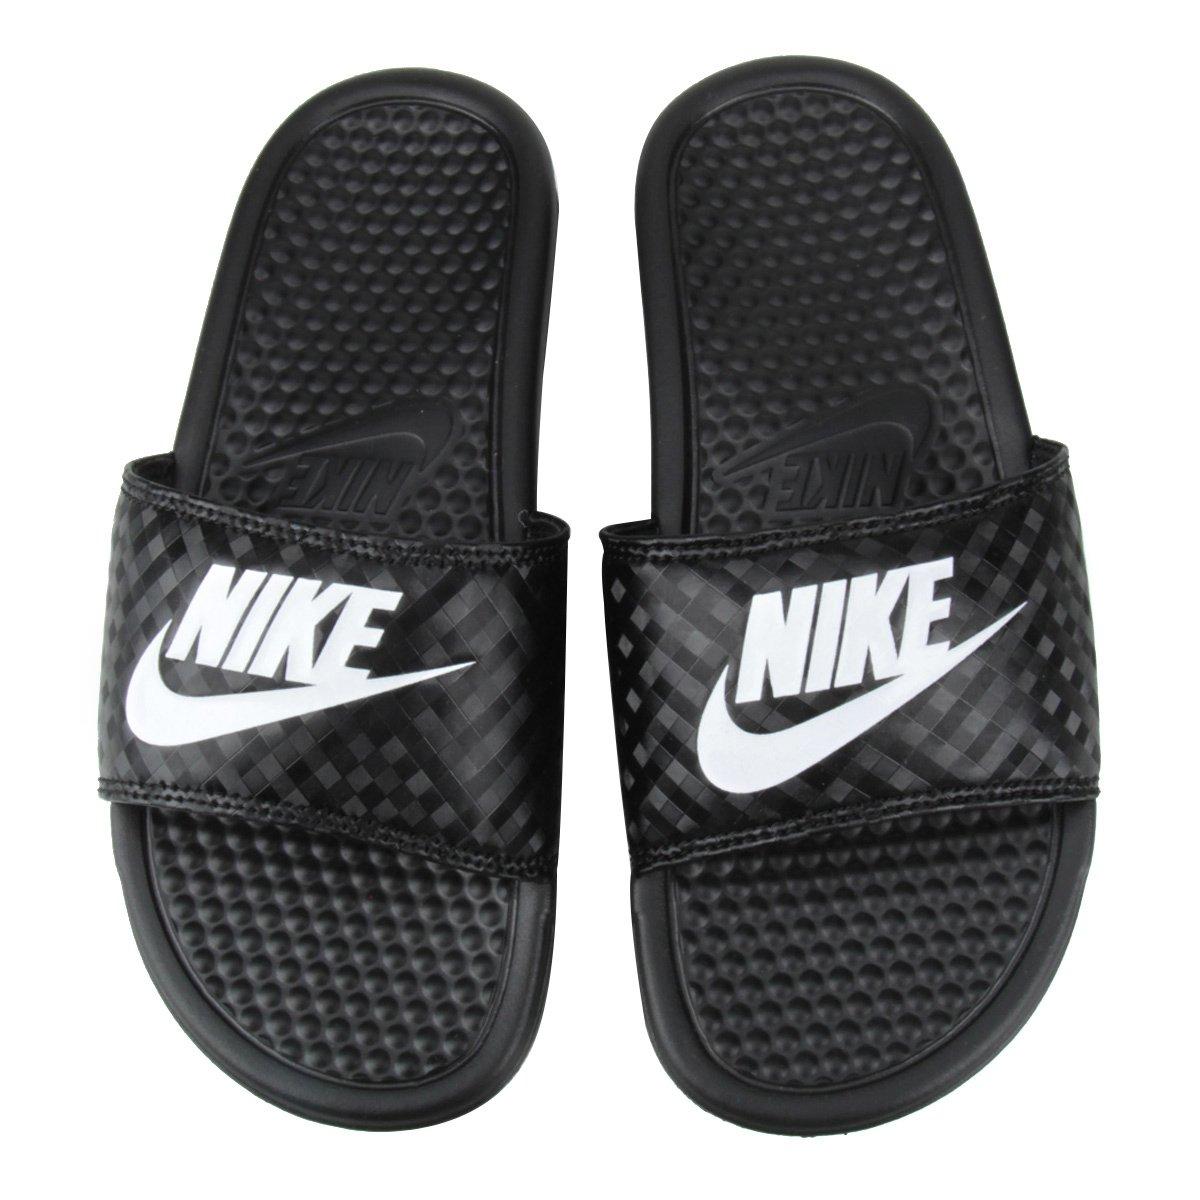 Chinelo Nike Benassi Jdi Slide Feminino Preto E Branco